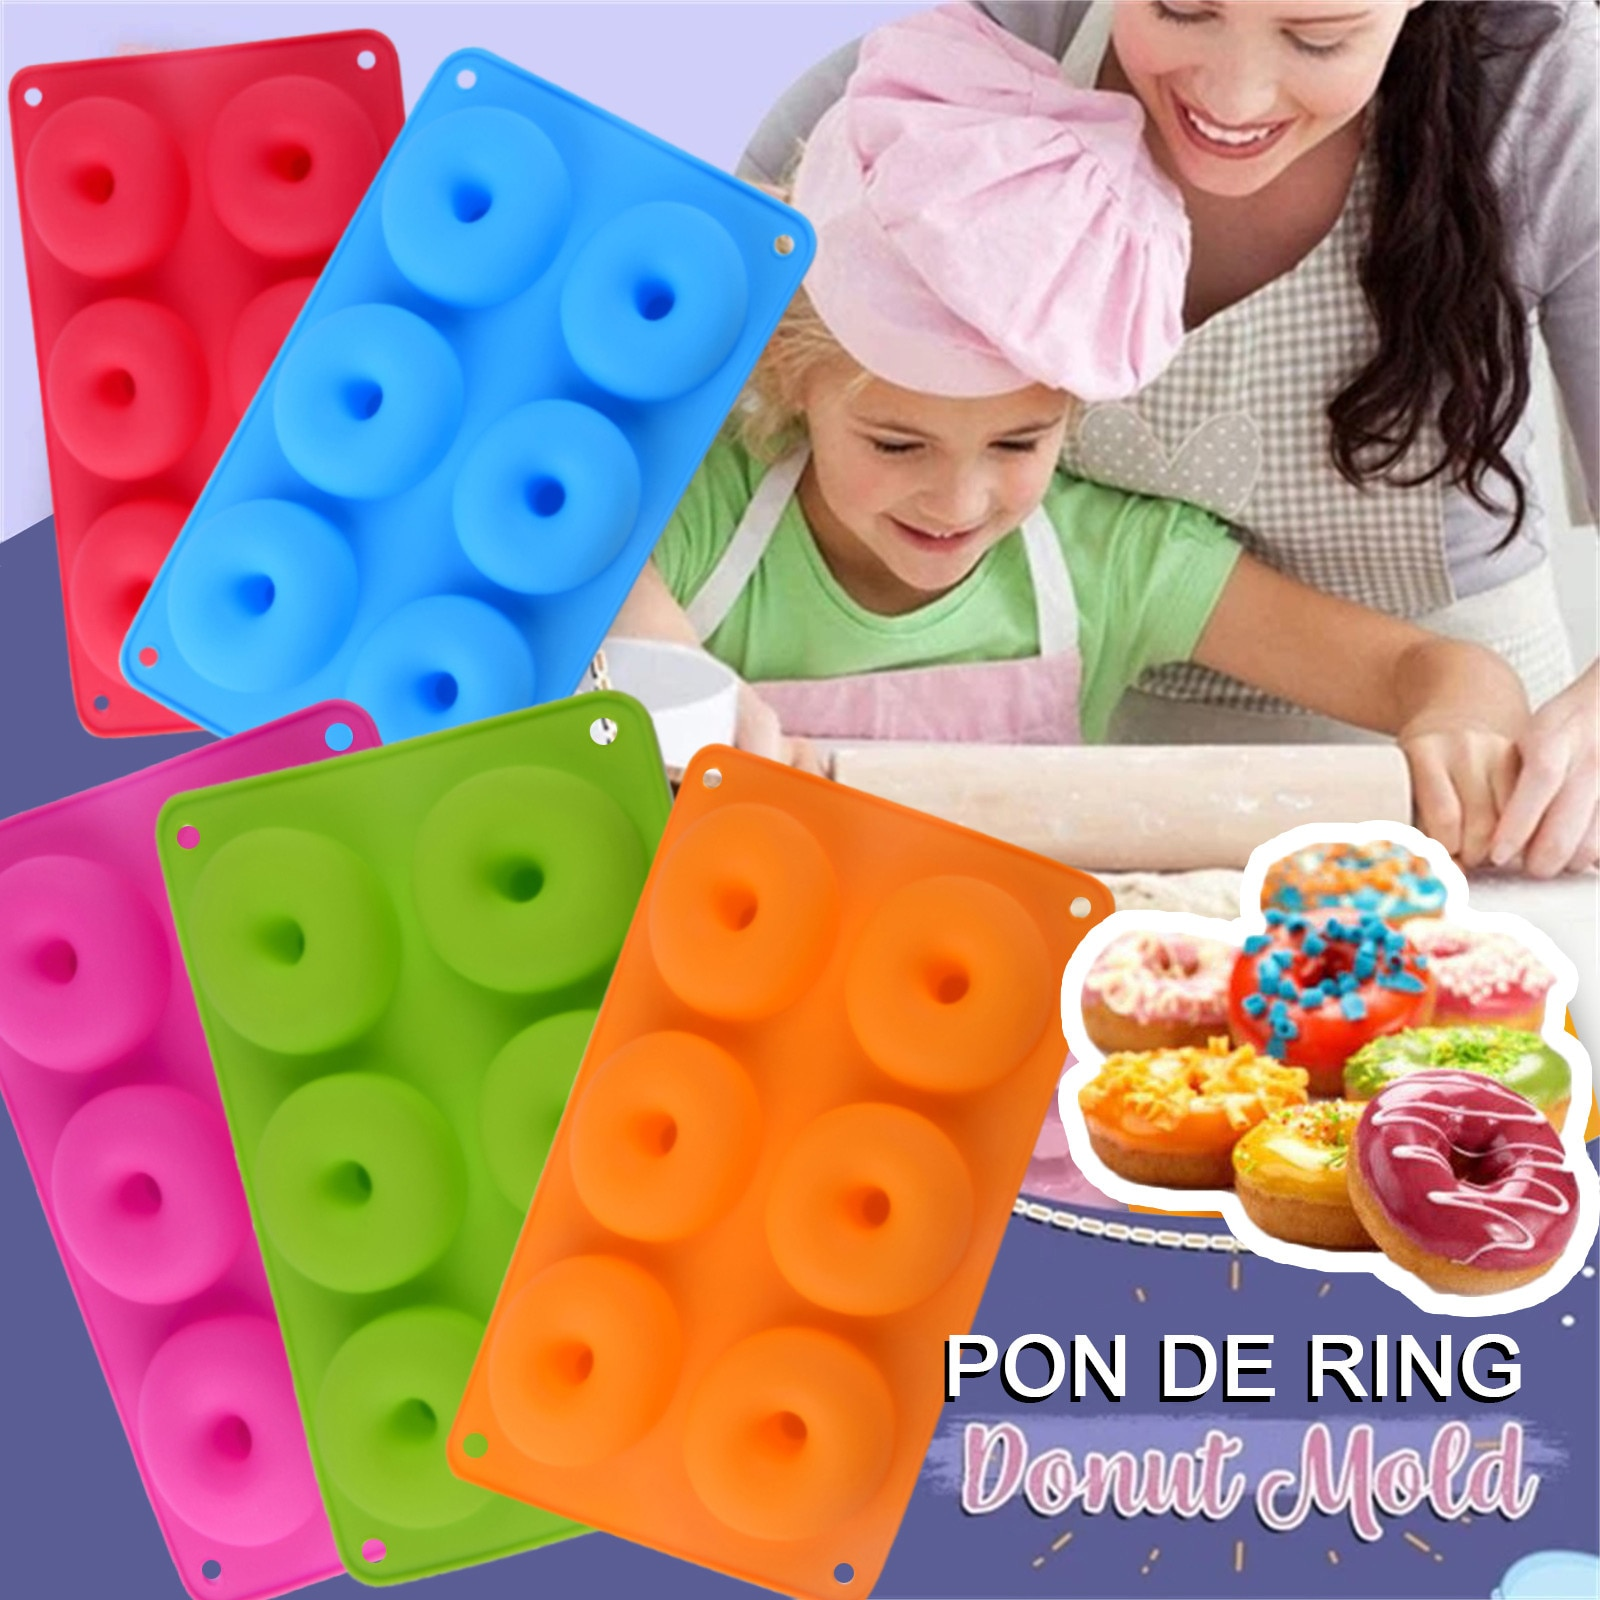 anillo-de-donut-molde-rosquilla-de-silicona-molde-no-stick-molde-para-donuts-bagels-y-ronda-mas-pasteleria-rosquilla-molde-anillos